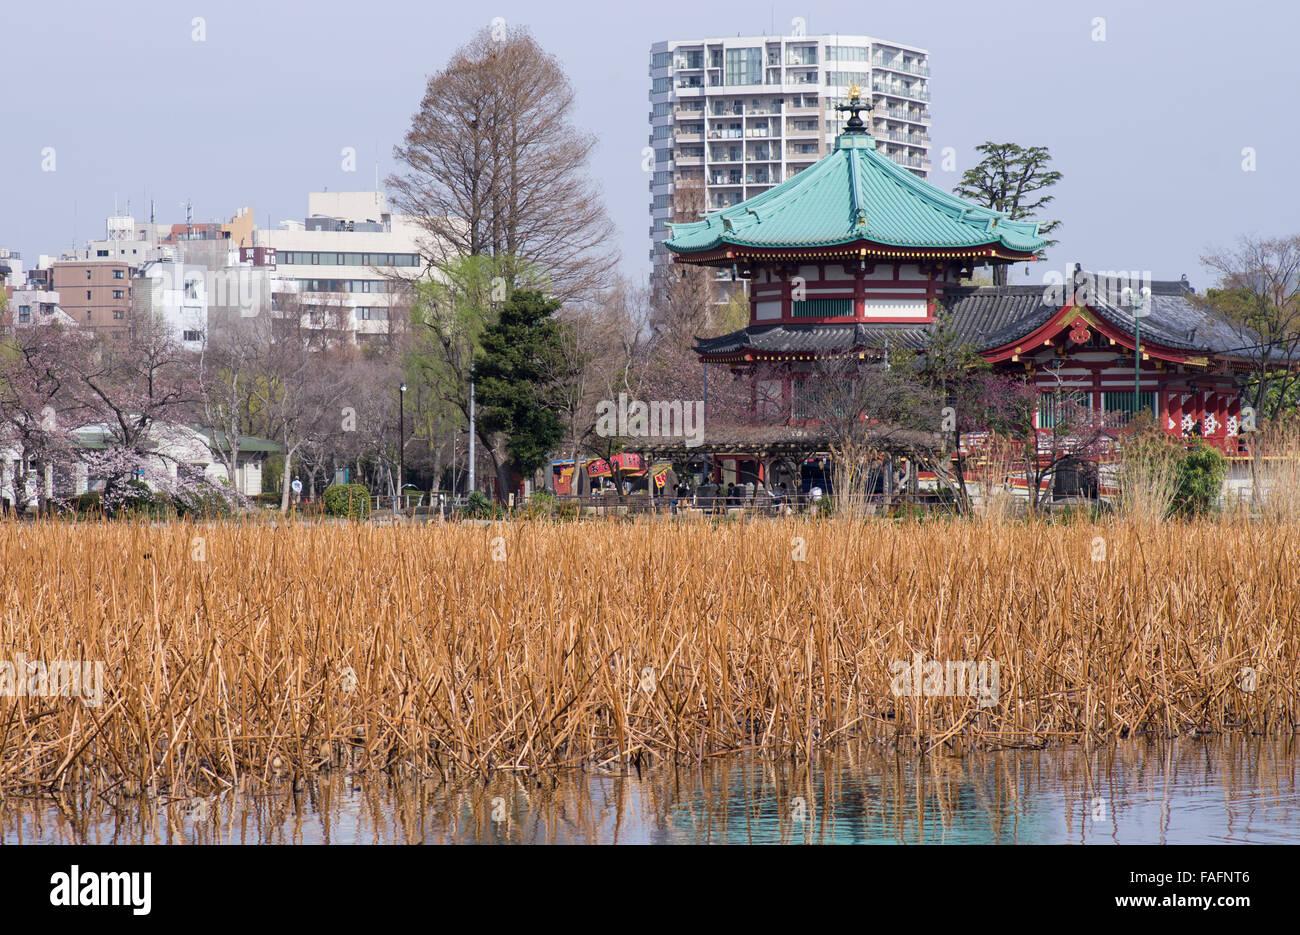 Bentendo with Shinobazu Pond at Ueno Park, Tokyo during cherry blossom season Stock Photo